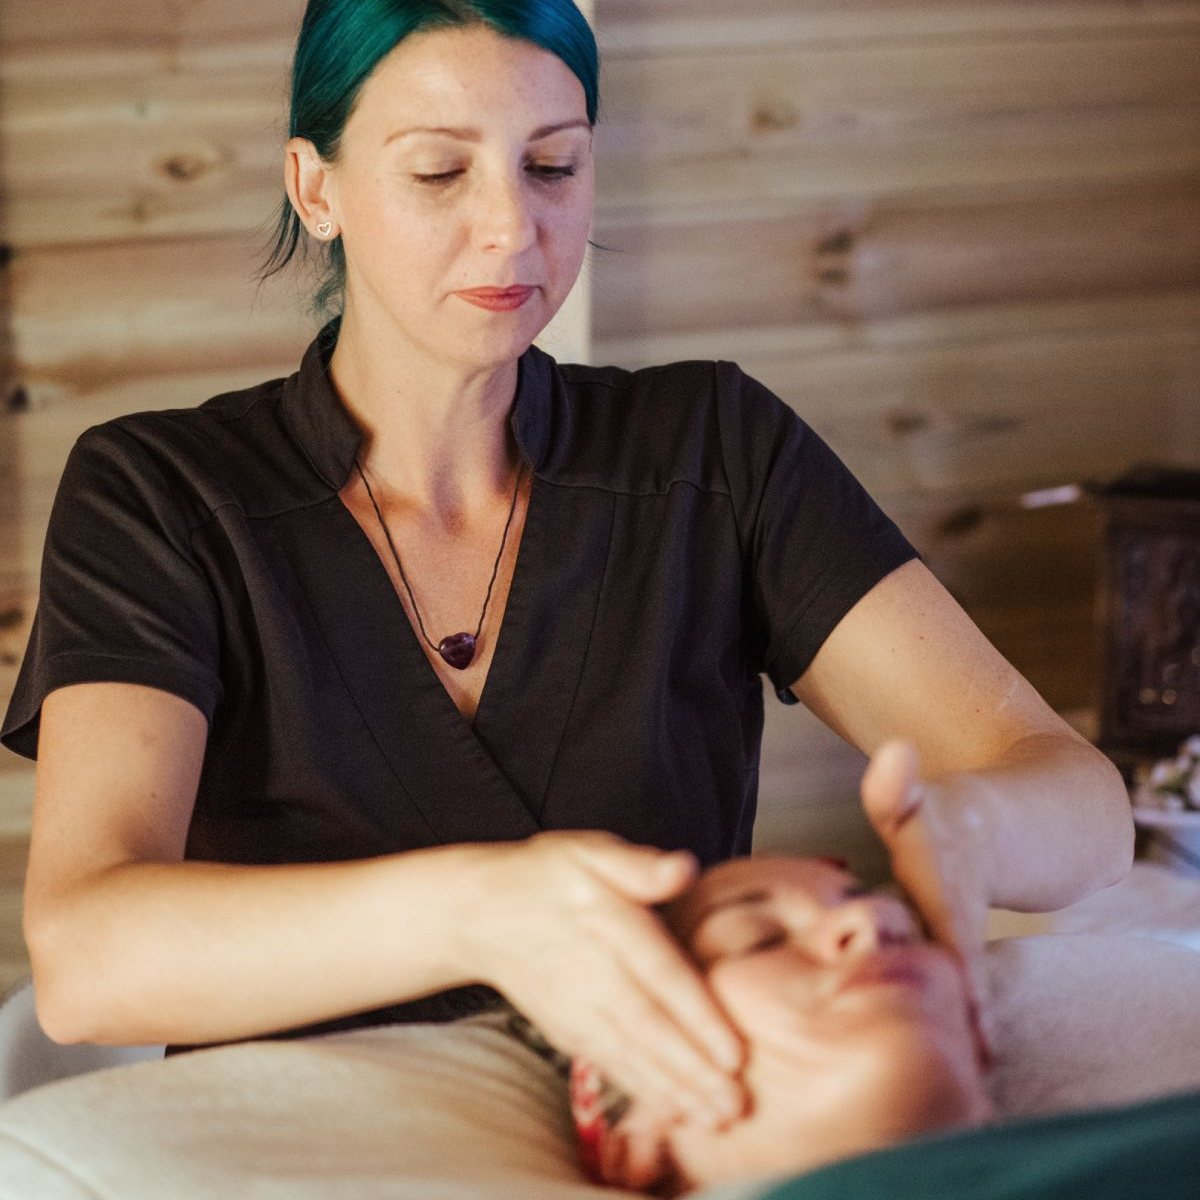 Relaxačná masáž tváre